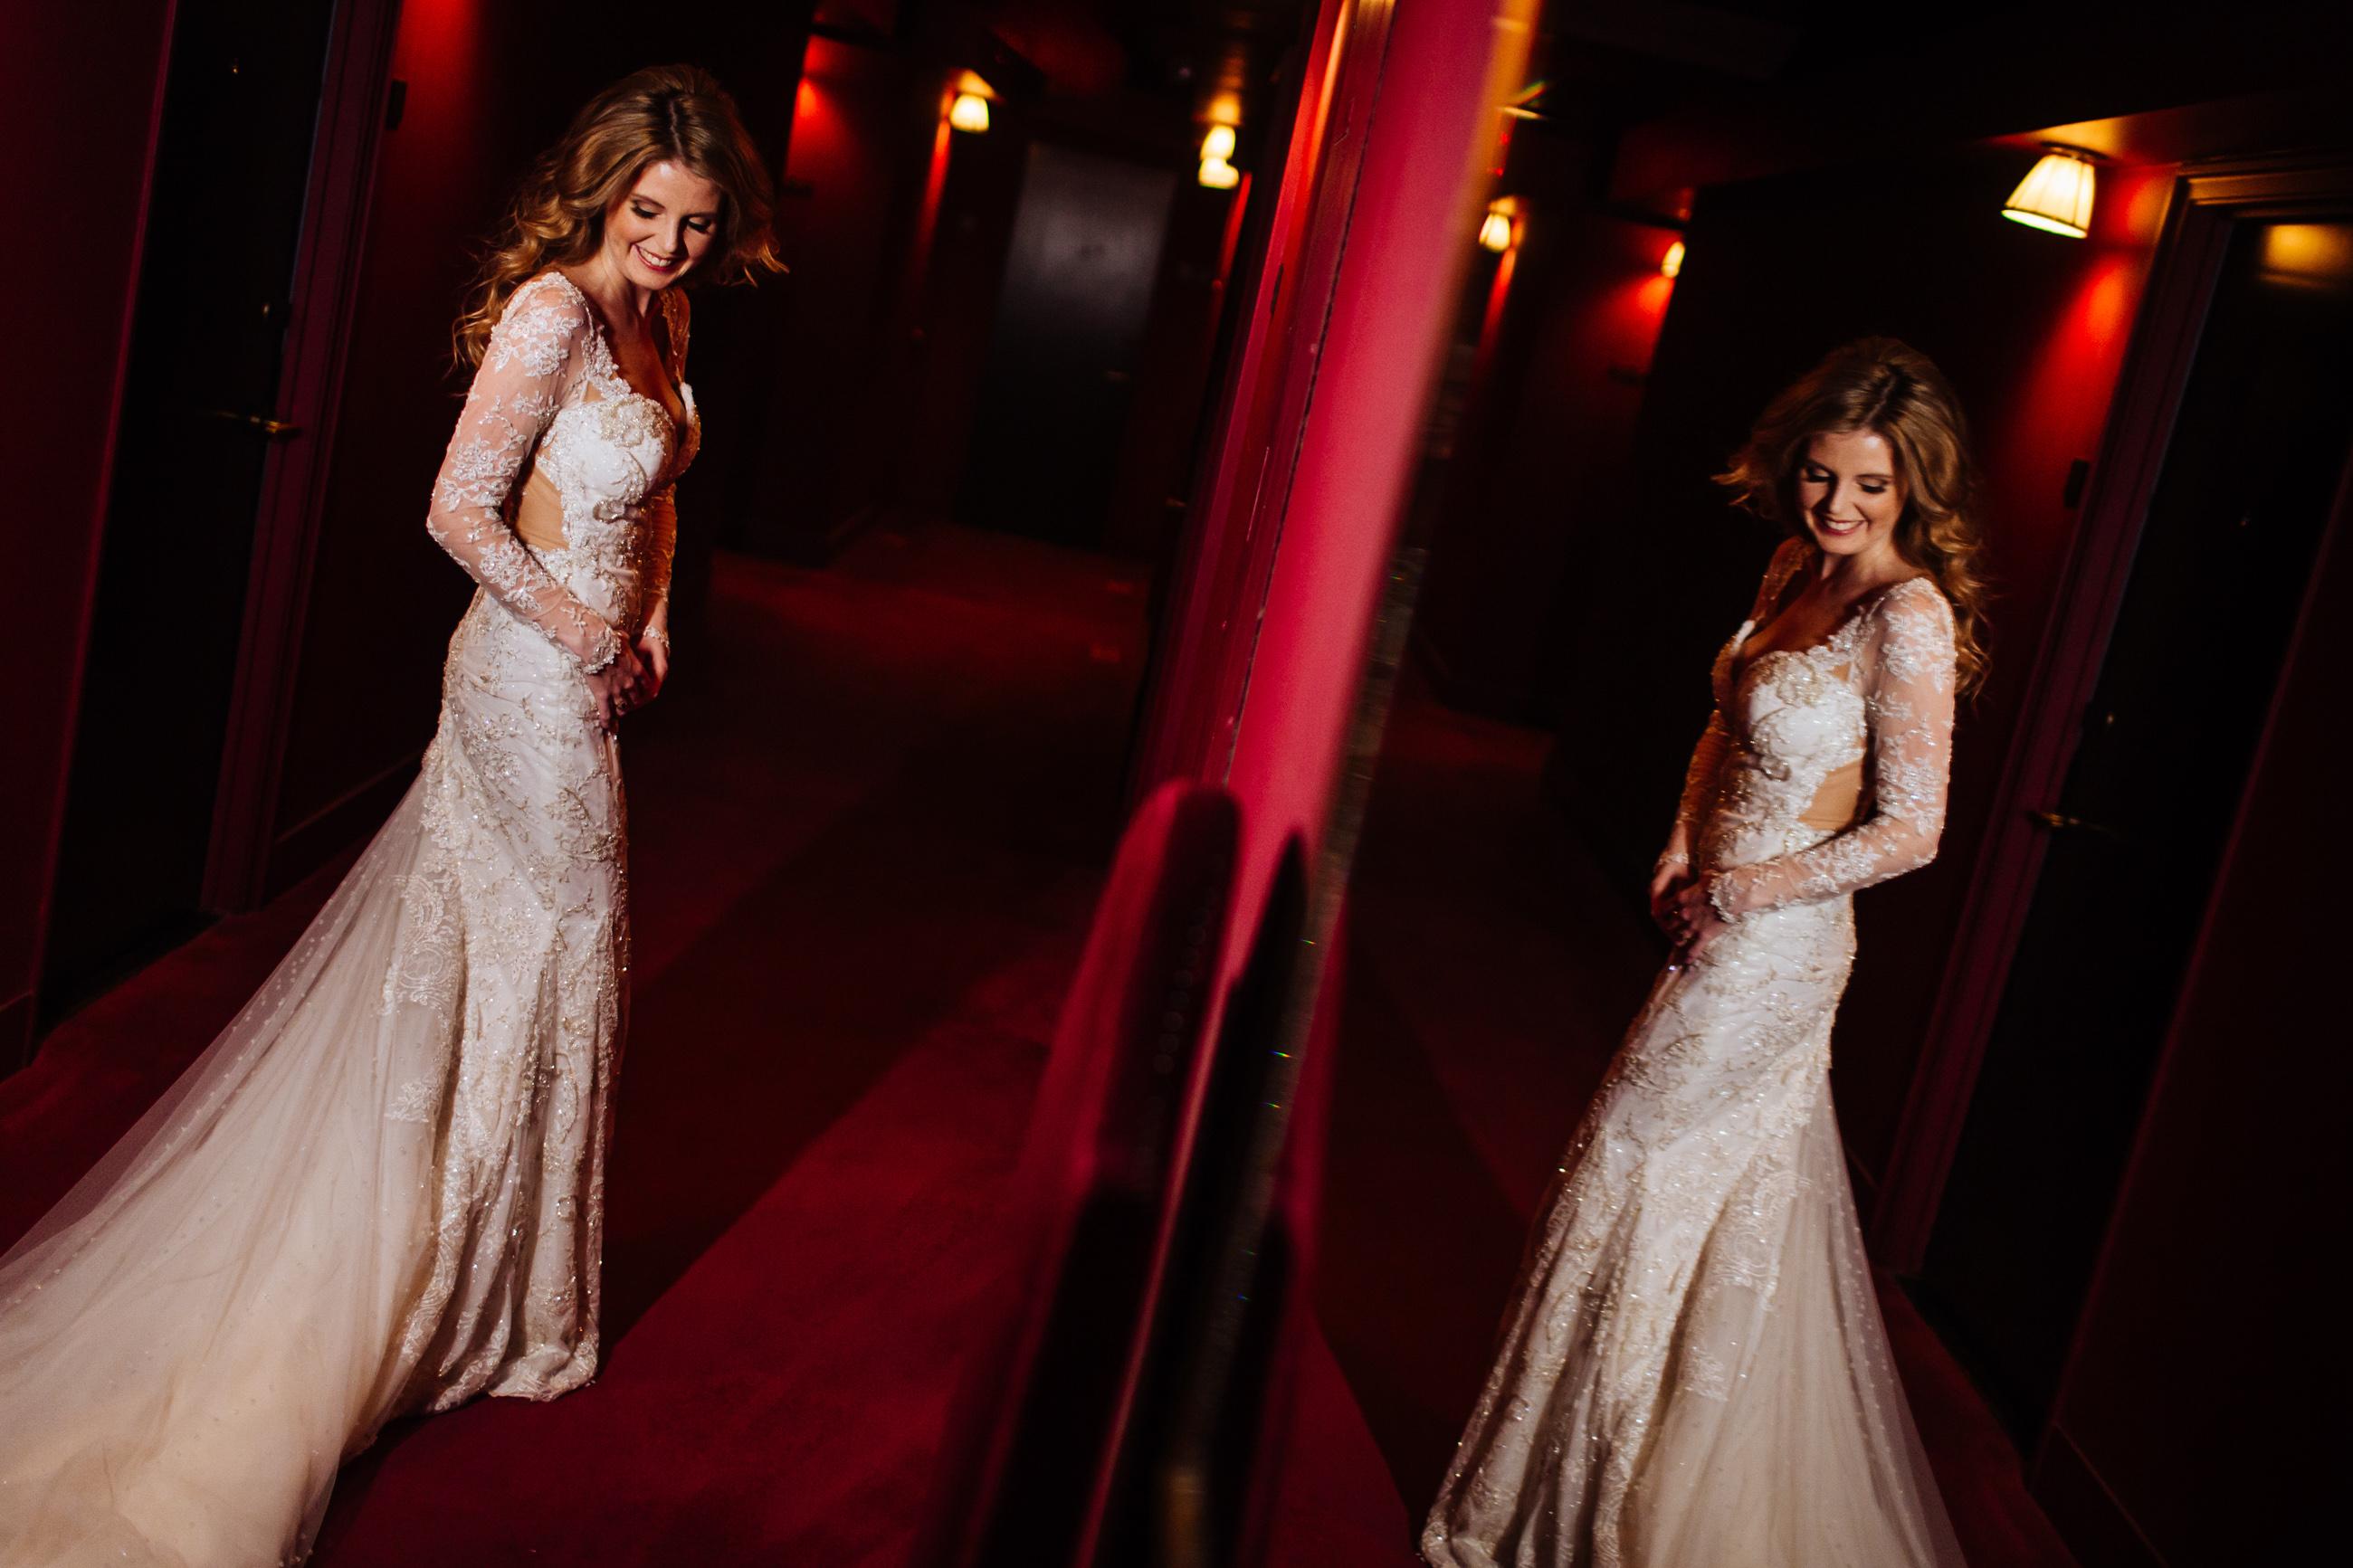 Gramercy Park Hotel Wedding Photographers